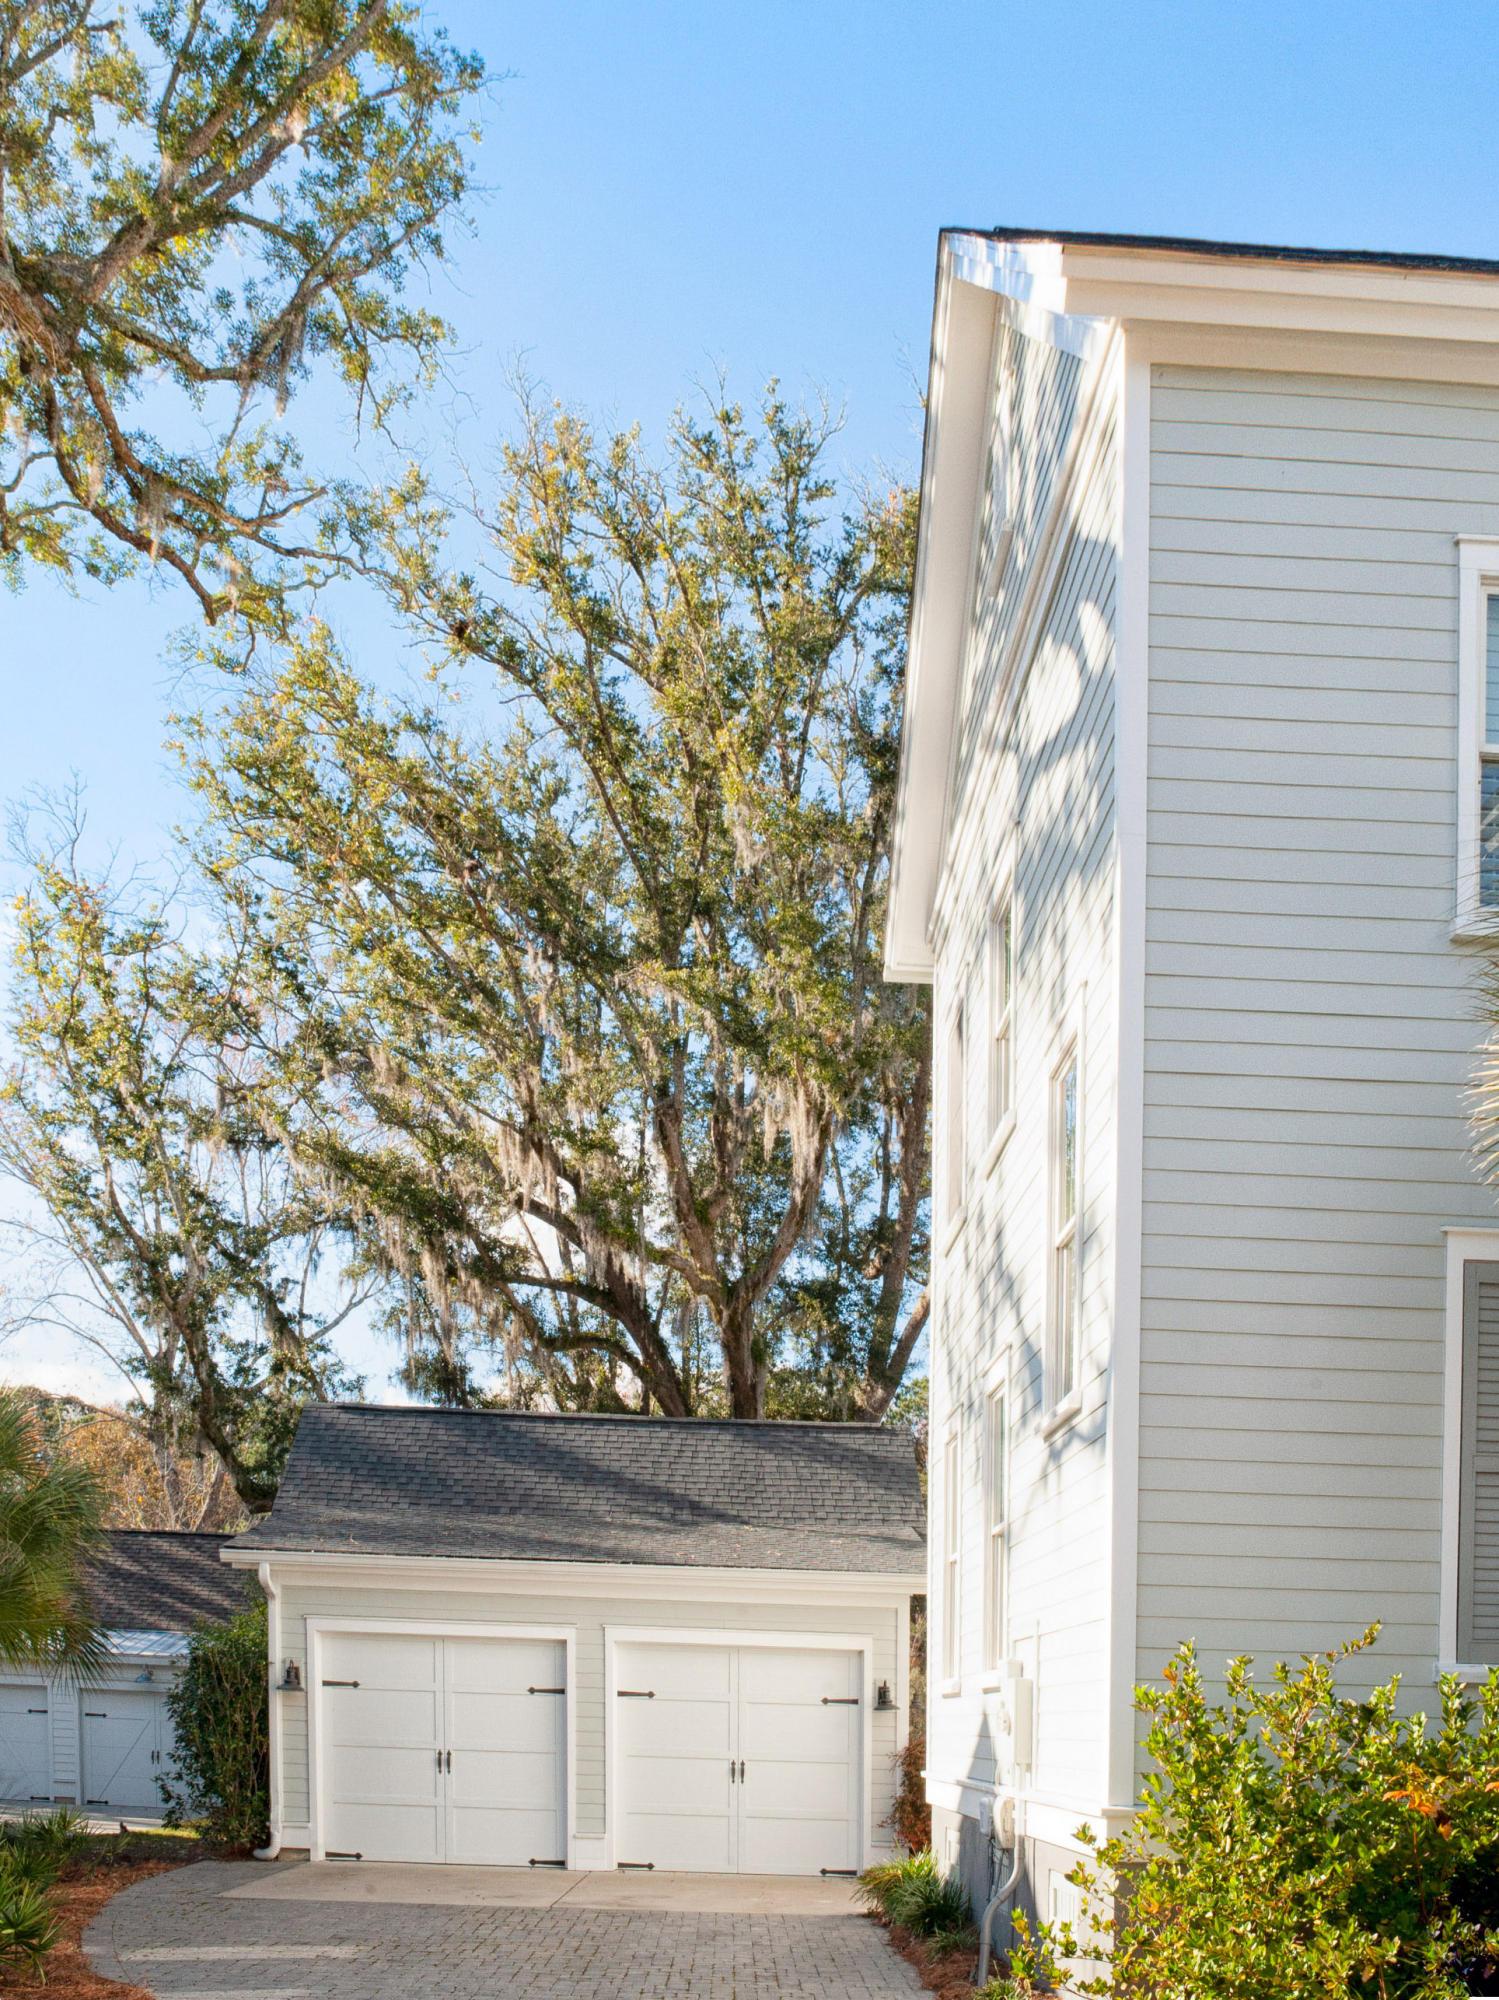 Carolina Park Homes For Sale - 1525 Lindsey Creek, Mount Pleasant, SC - 21